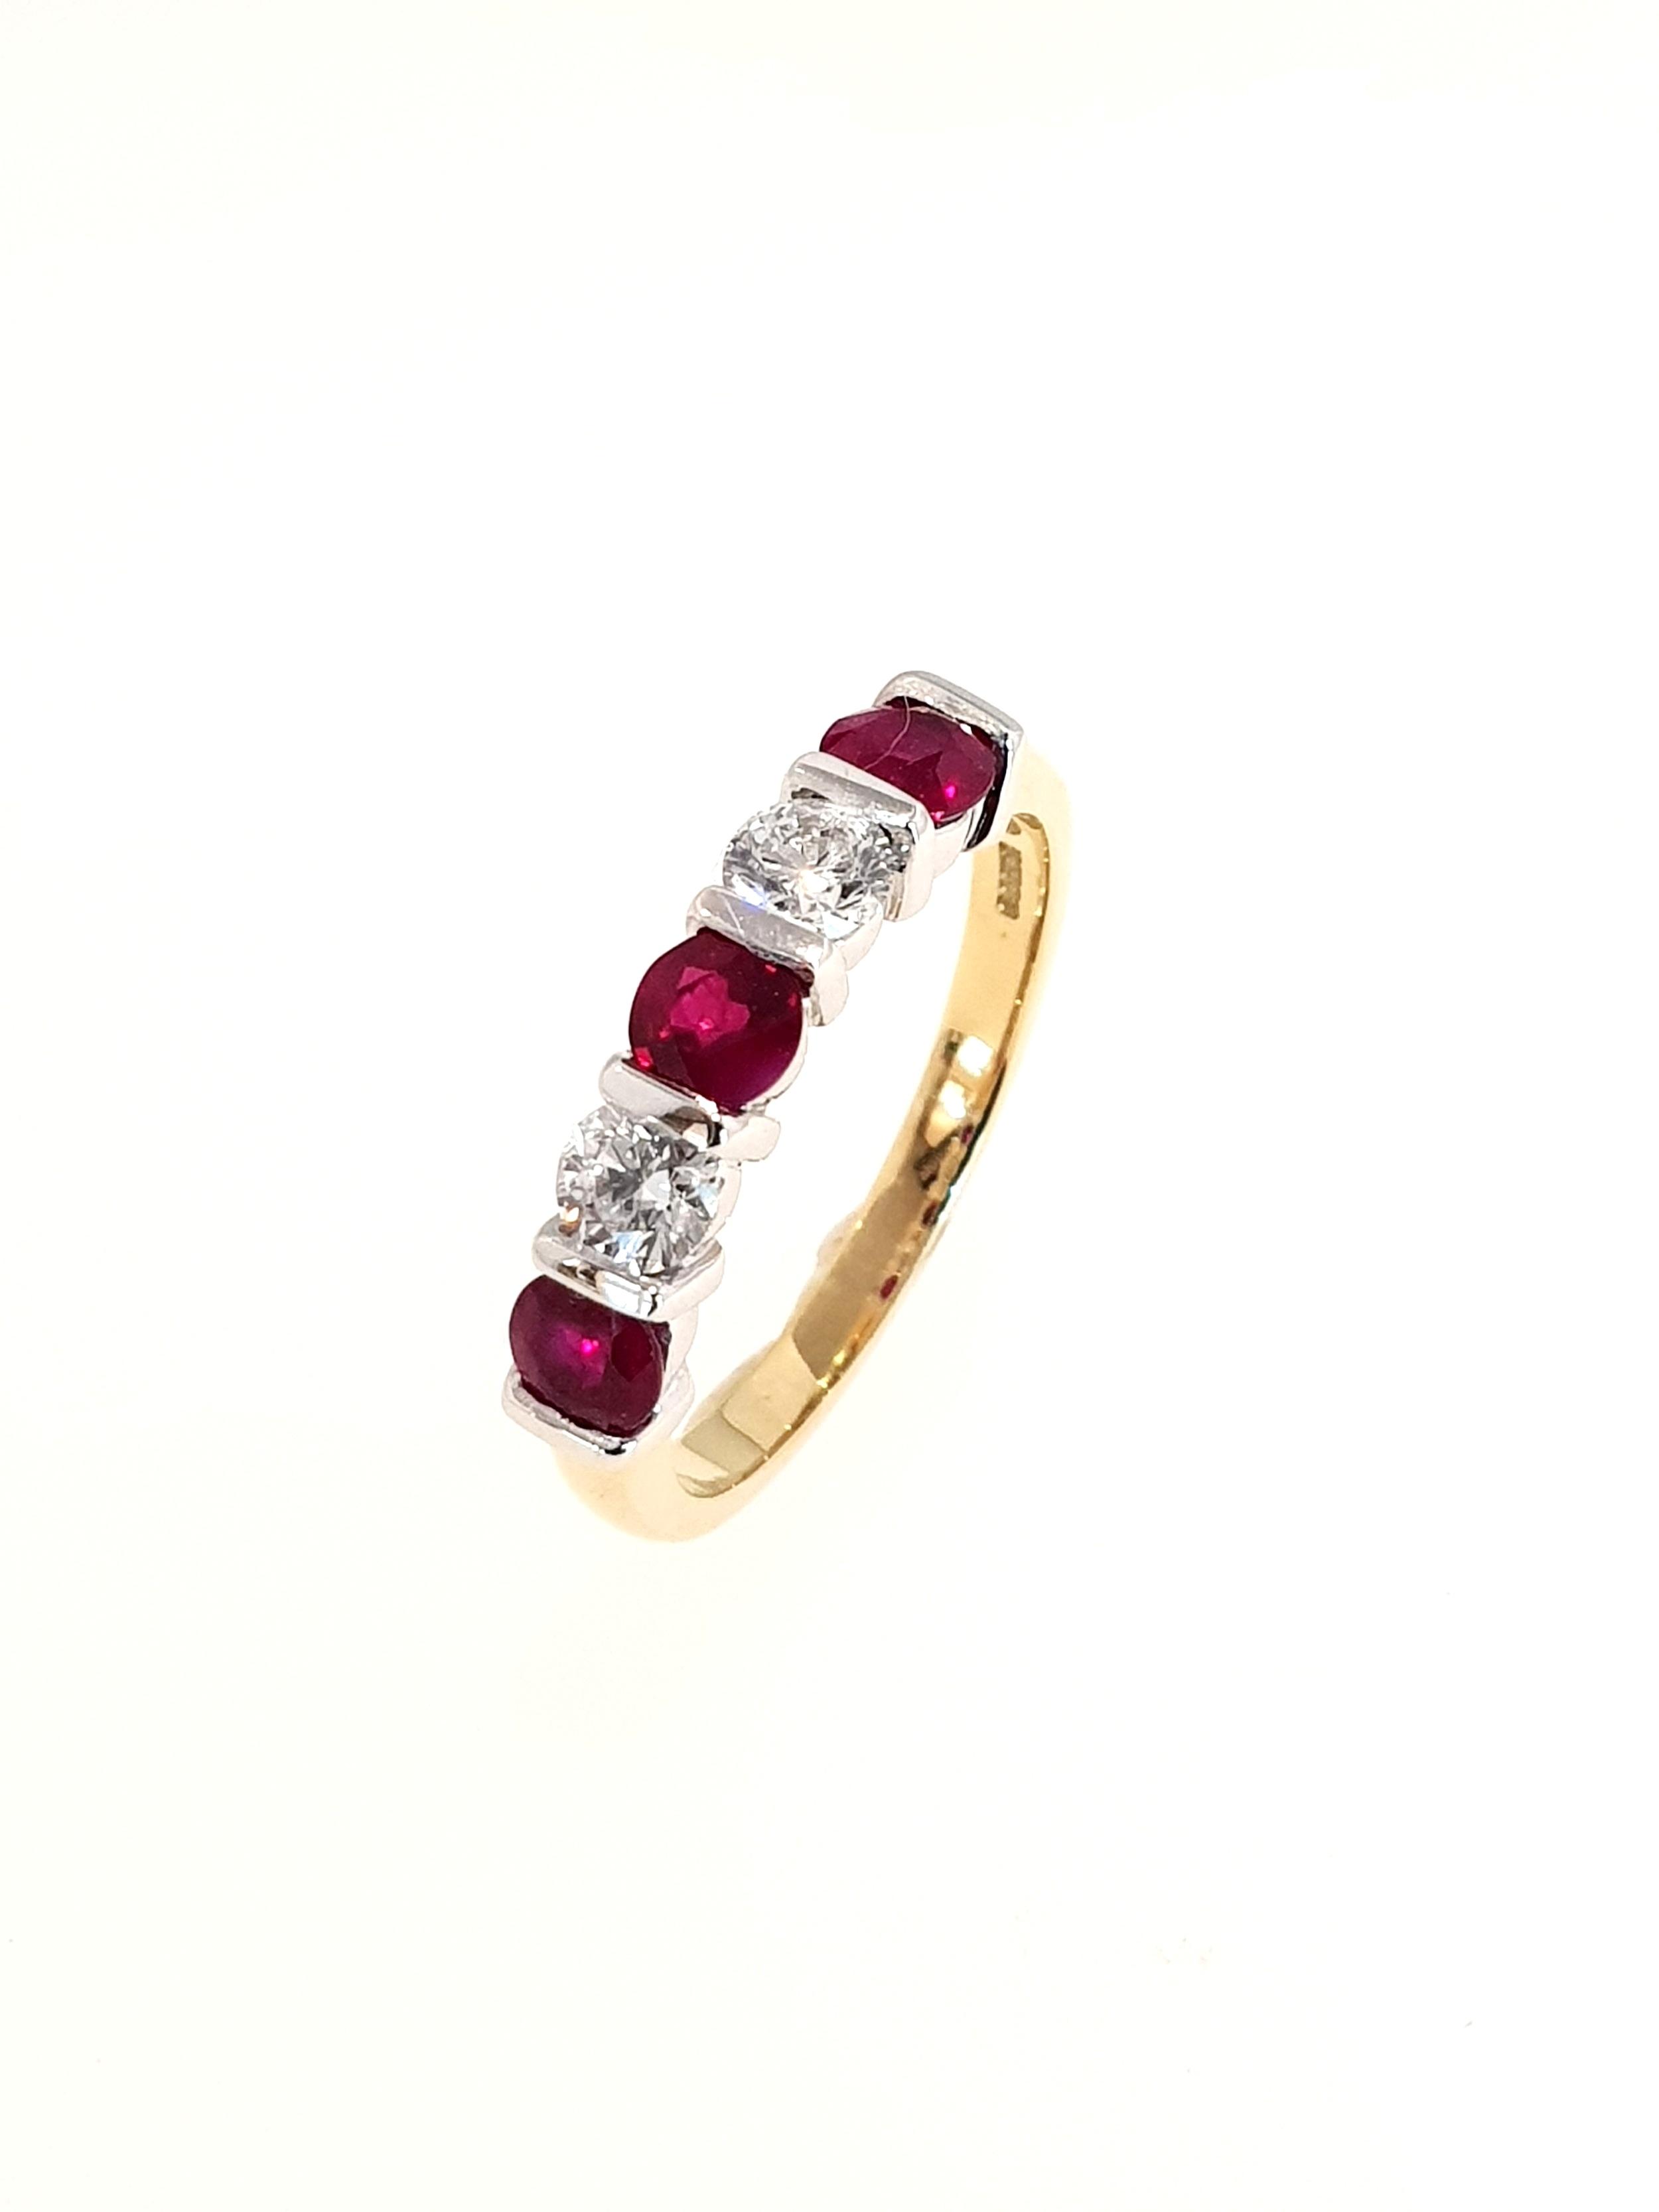 18ct Yellow Gold Ruby(.85ct) & Diamond Ring  Diamond: .41ct, G, Si1  Stock Code: N8980  £2100